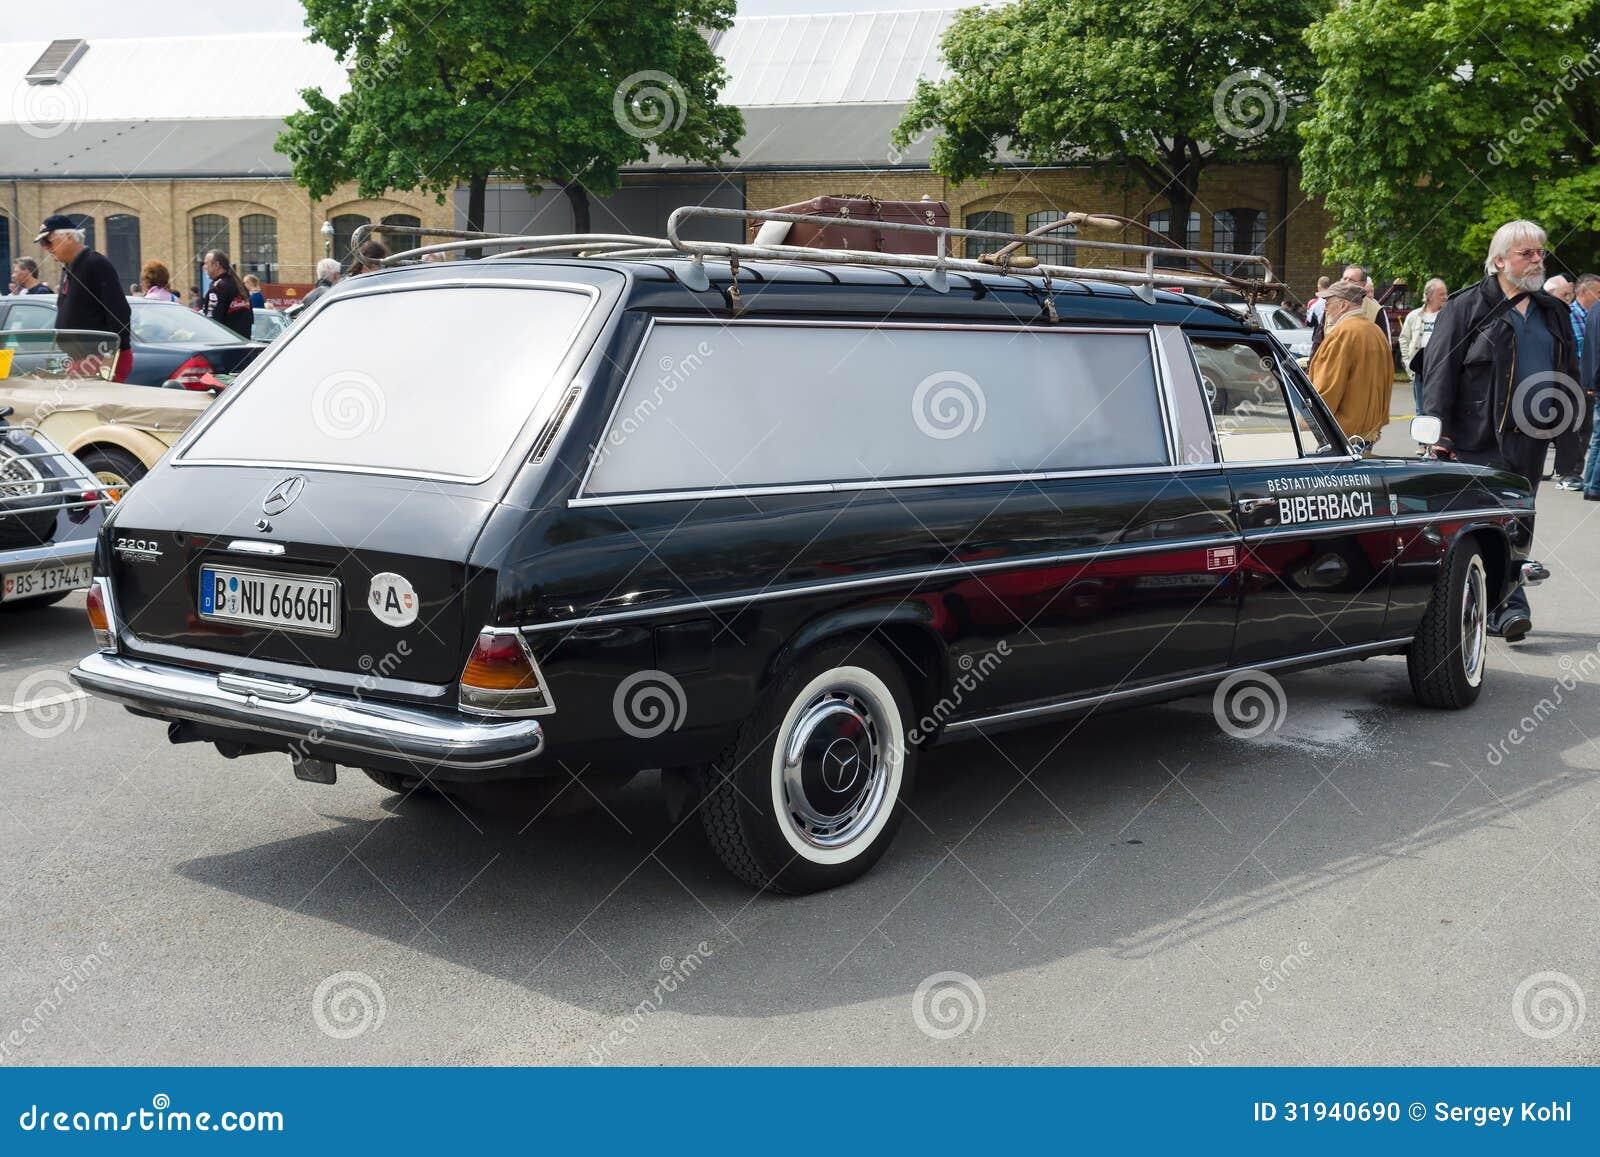 car hearse mercedes benz 220d w114 editorial image image 31940690. Black Bedroom Furniture Sets. Home Design Ideas